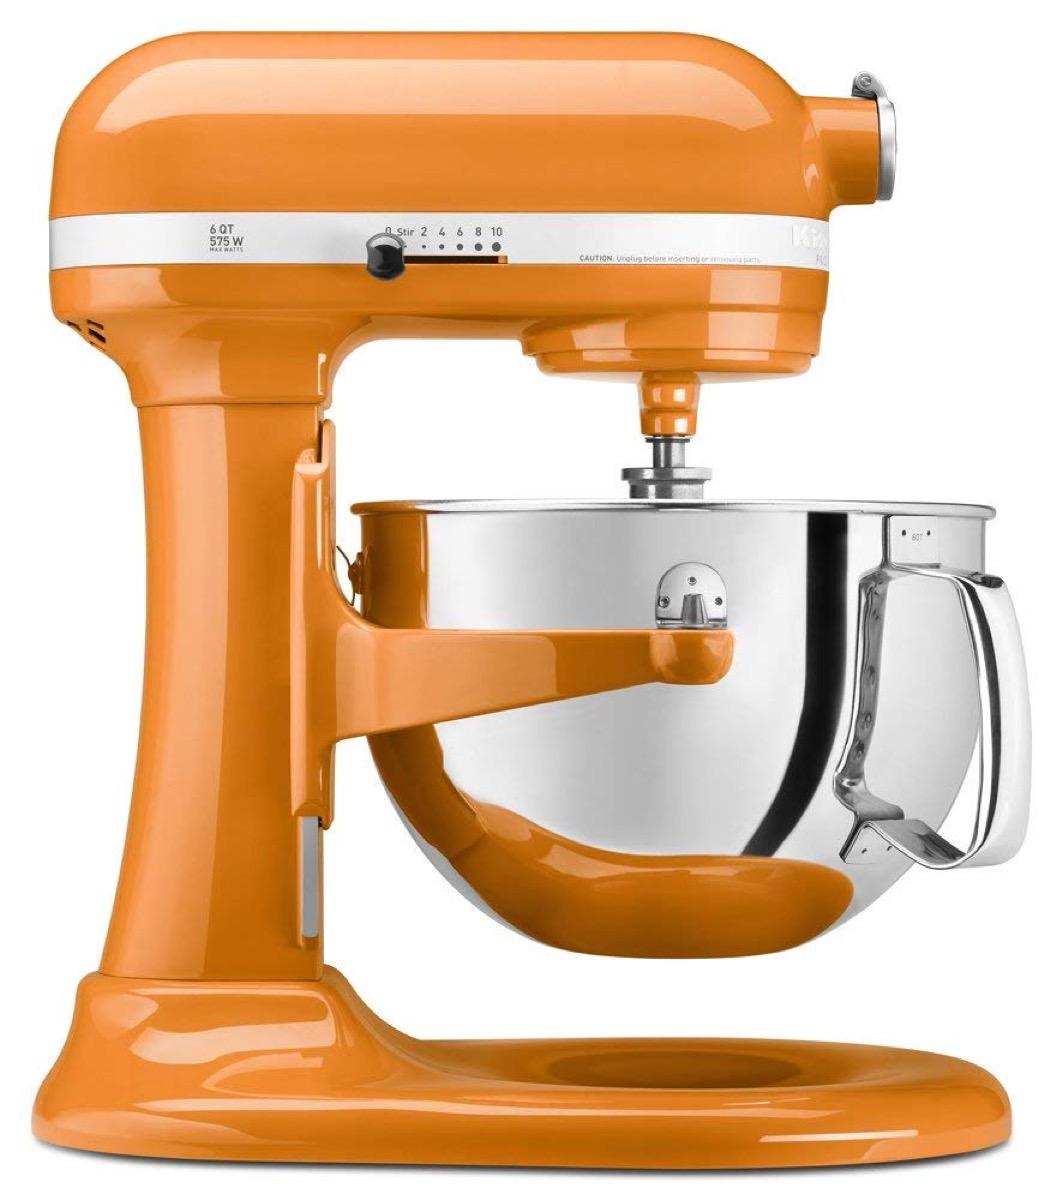 kitchenaid orange mixer appliances with cult followings